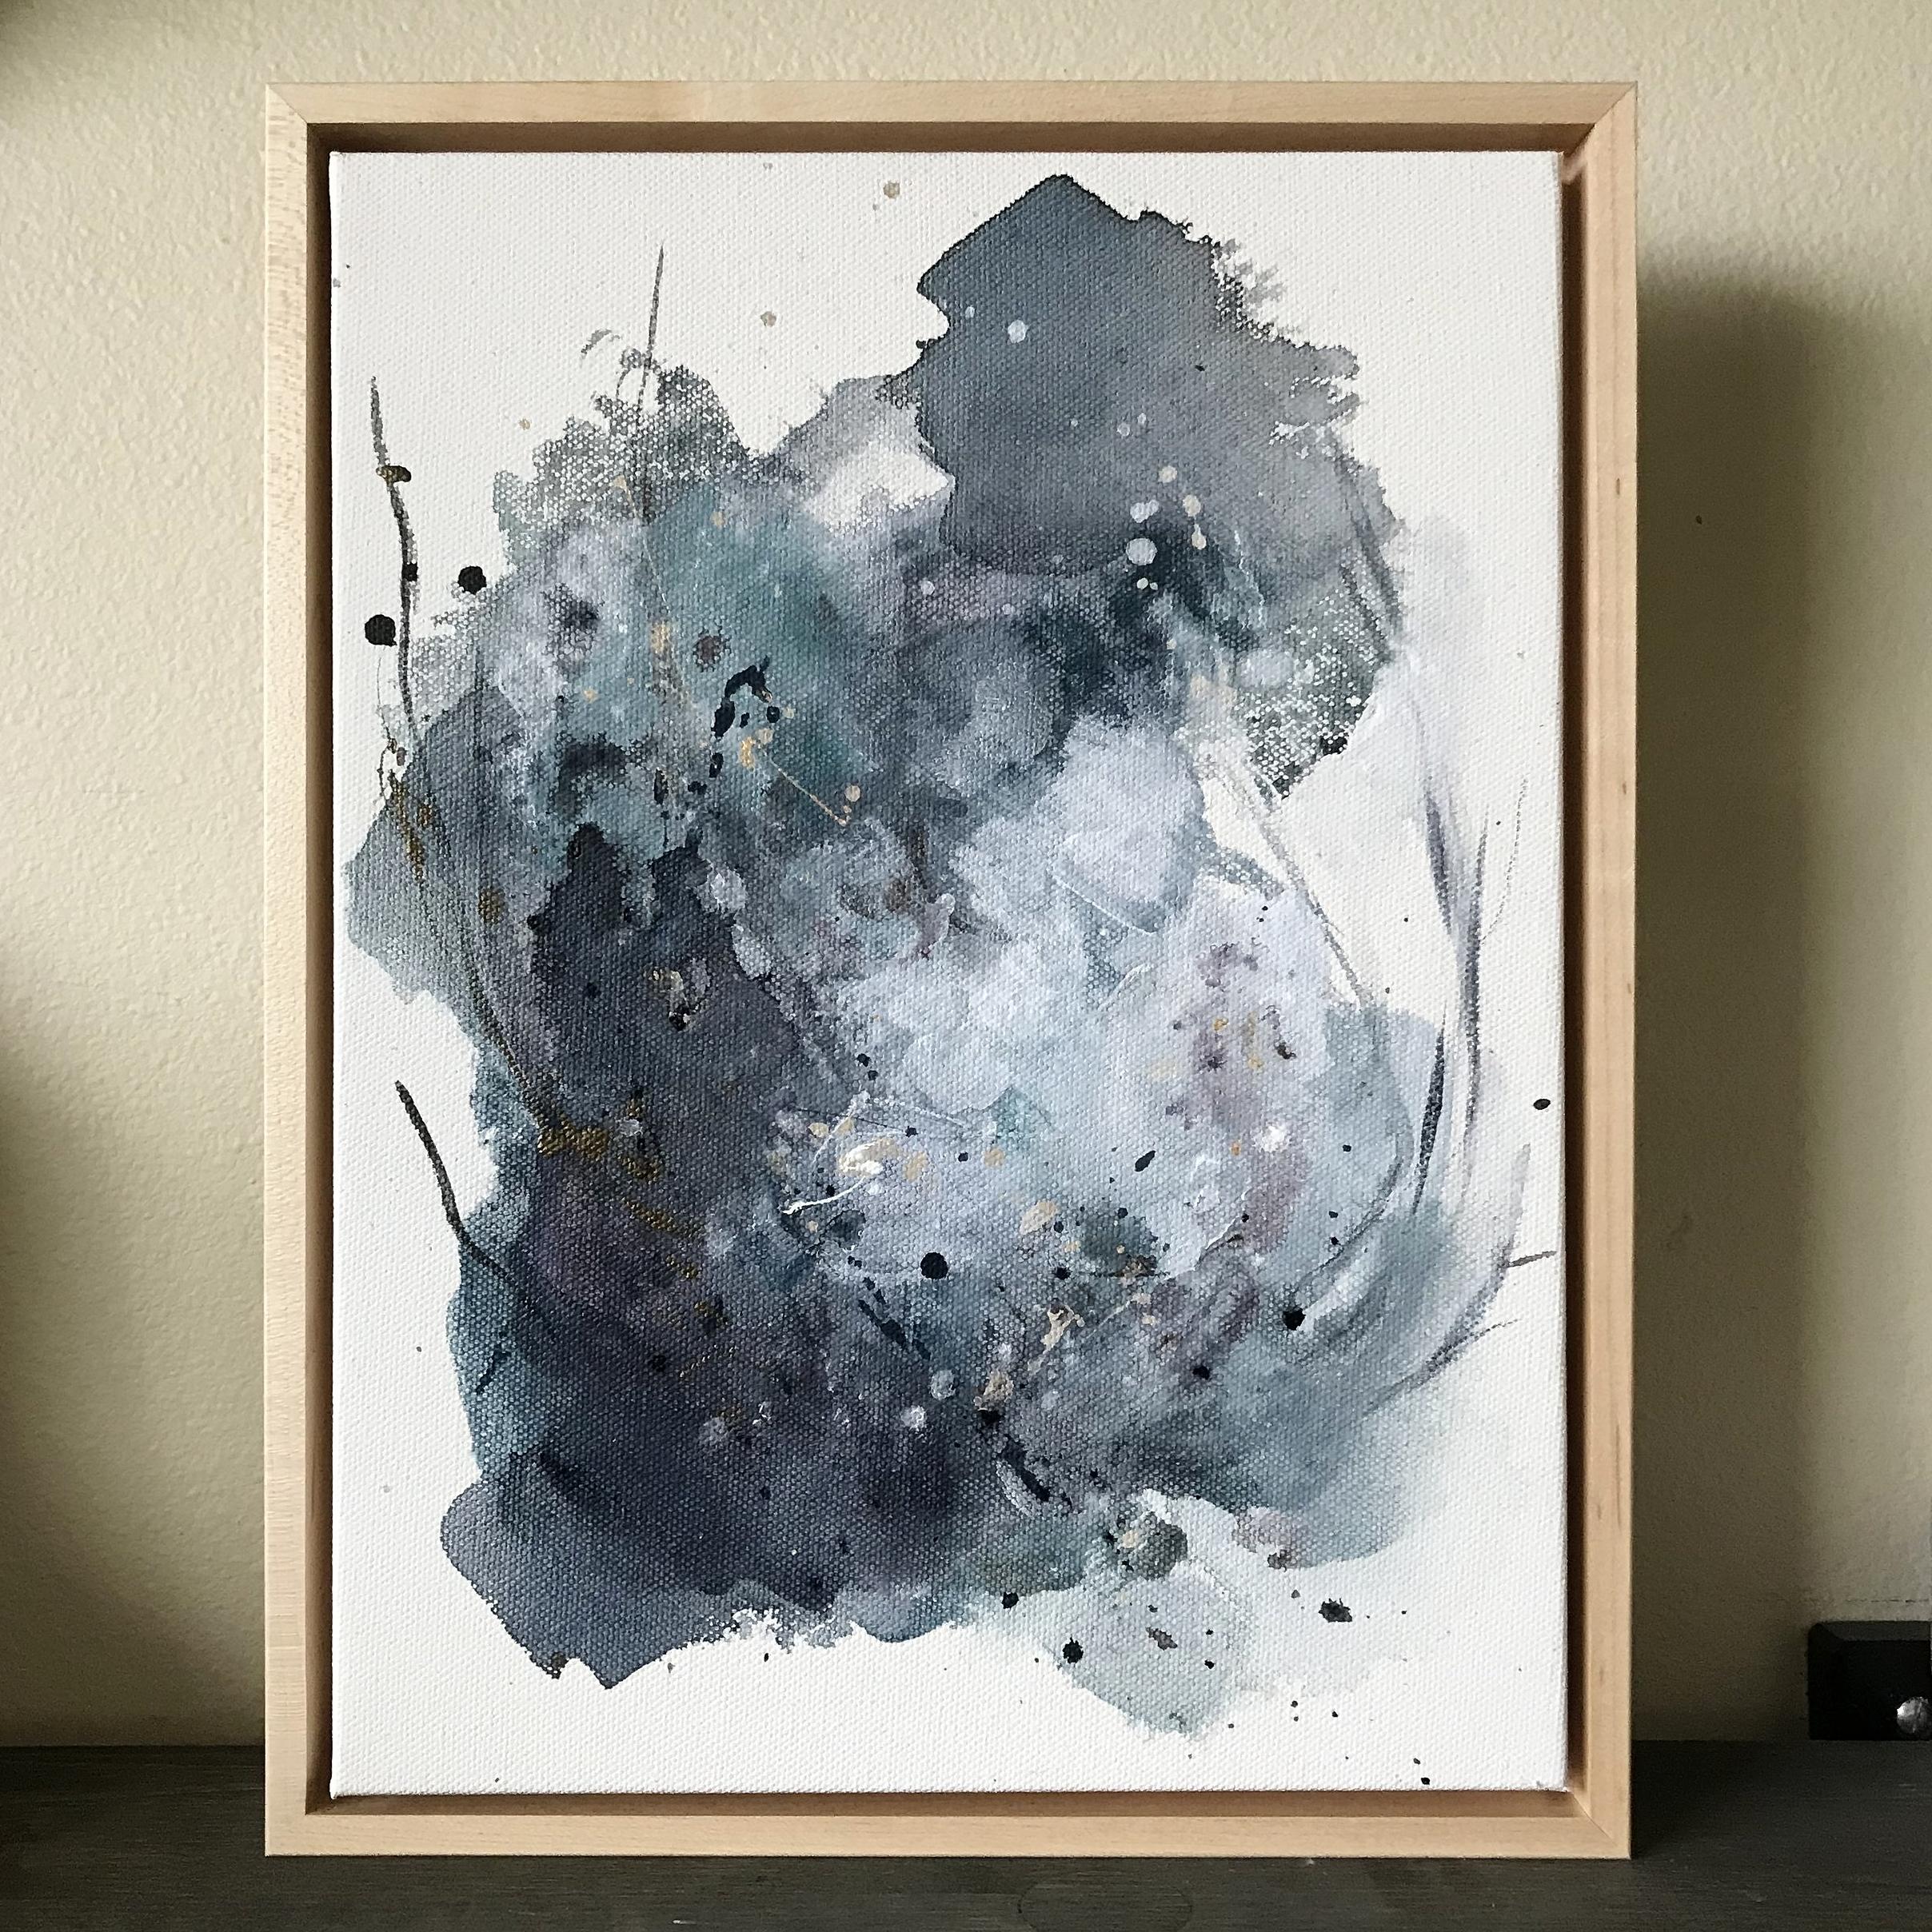 New abstract artwork coming February 4th!! - Kendra Castillo